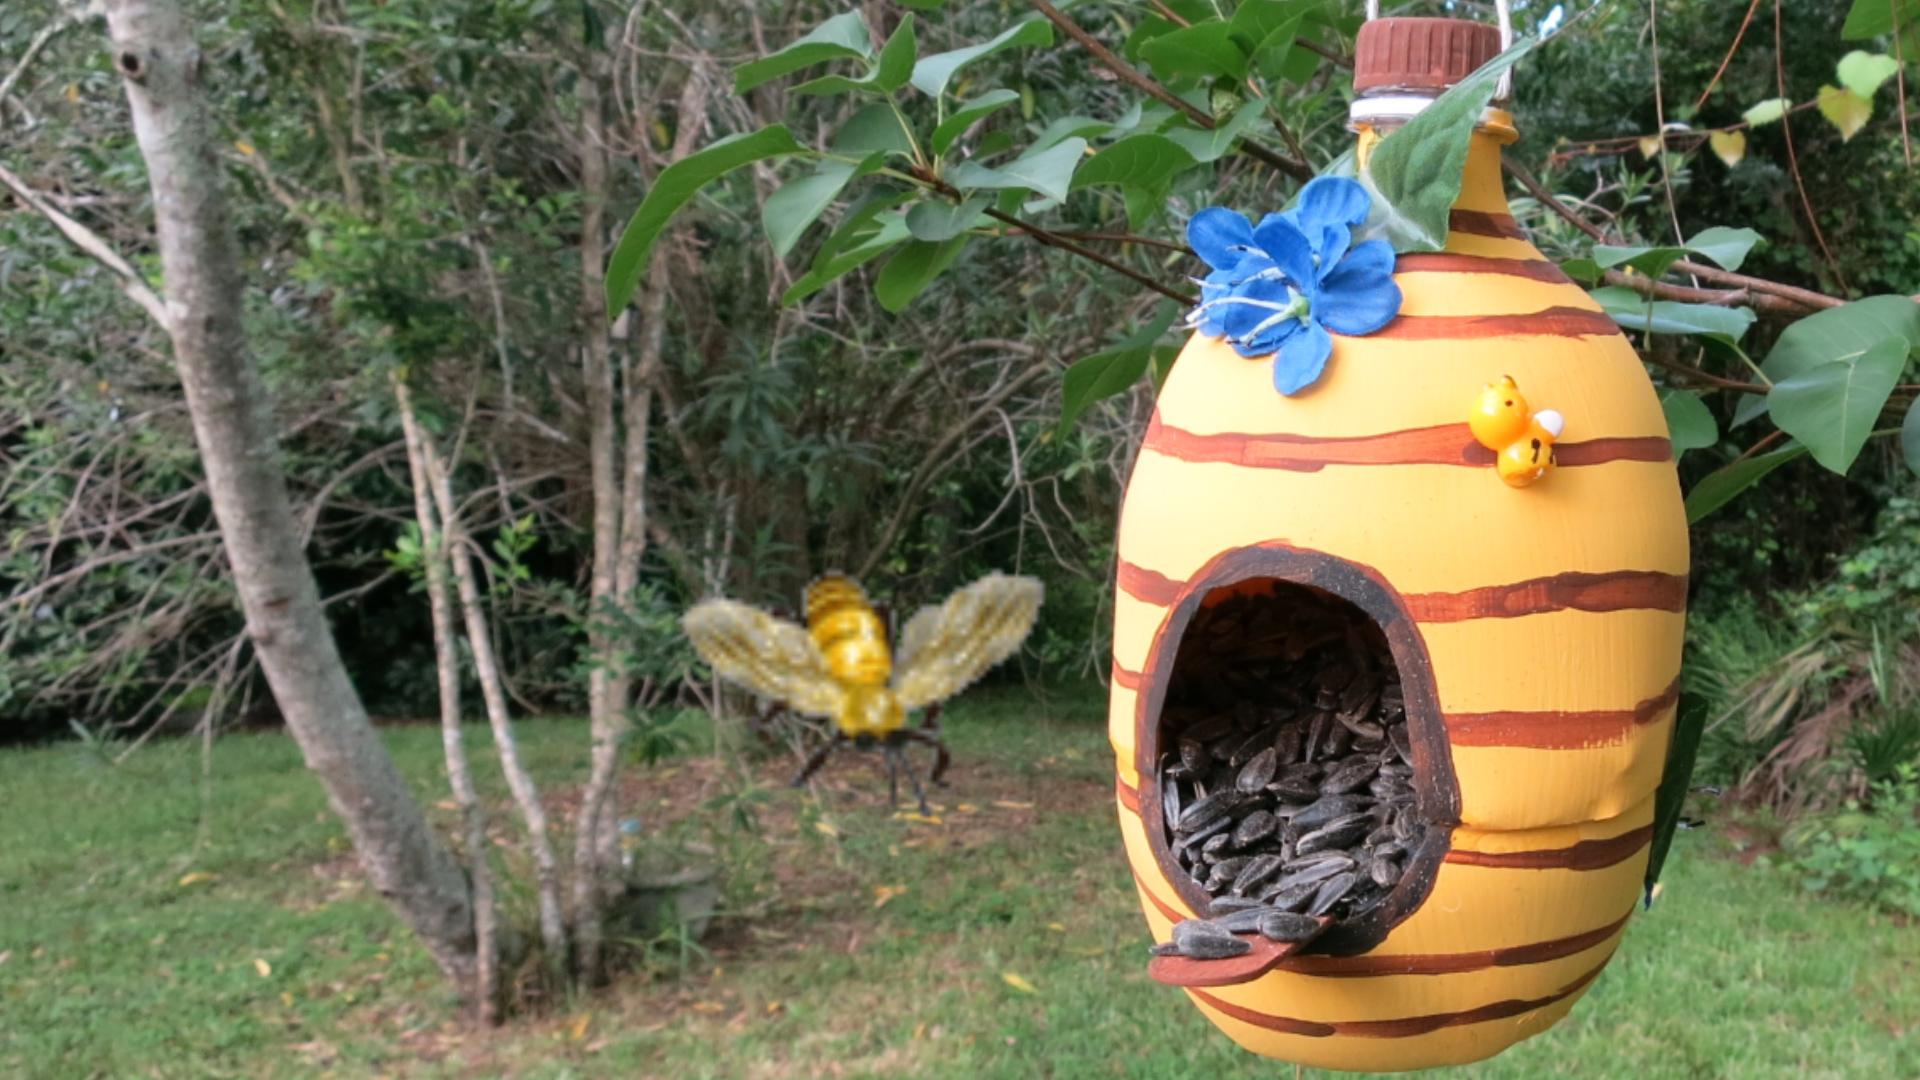 Bee Hive Bird House Recycled Bottle Bird Feeder.jpg